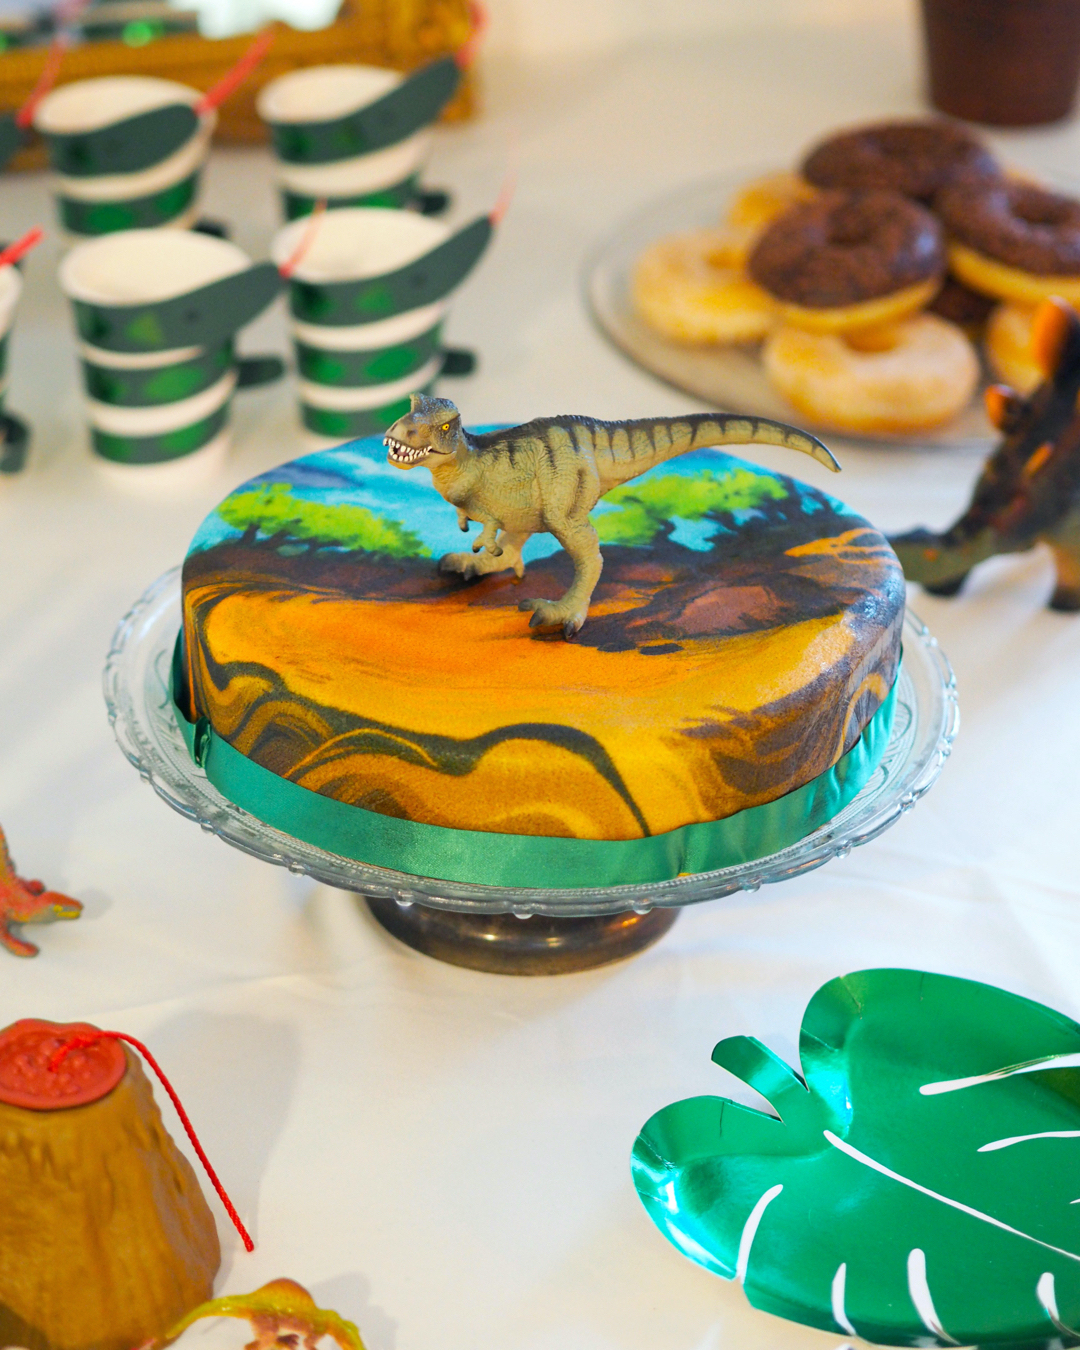 Geburtstagstorte Junge - Kinder & Kindergeburtstagstorten über Geburtstagstorte Für Jungs